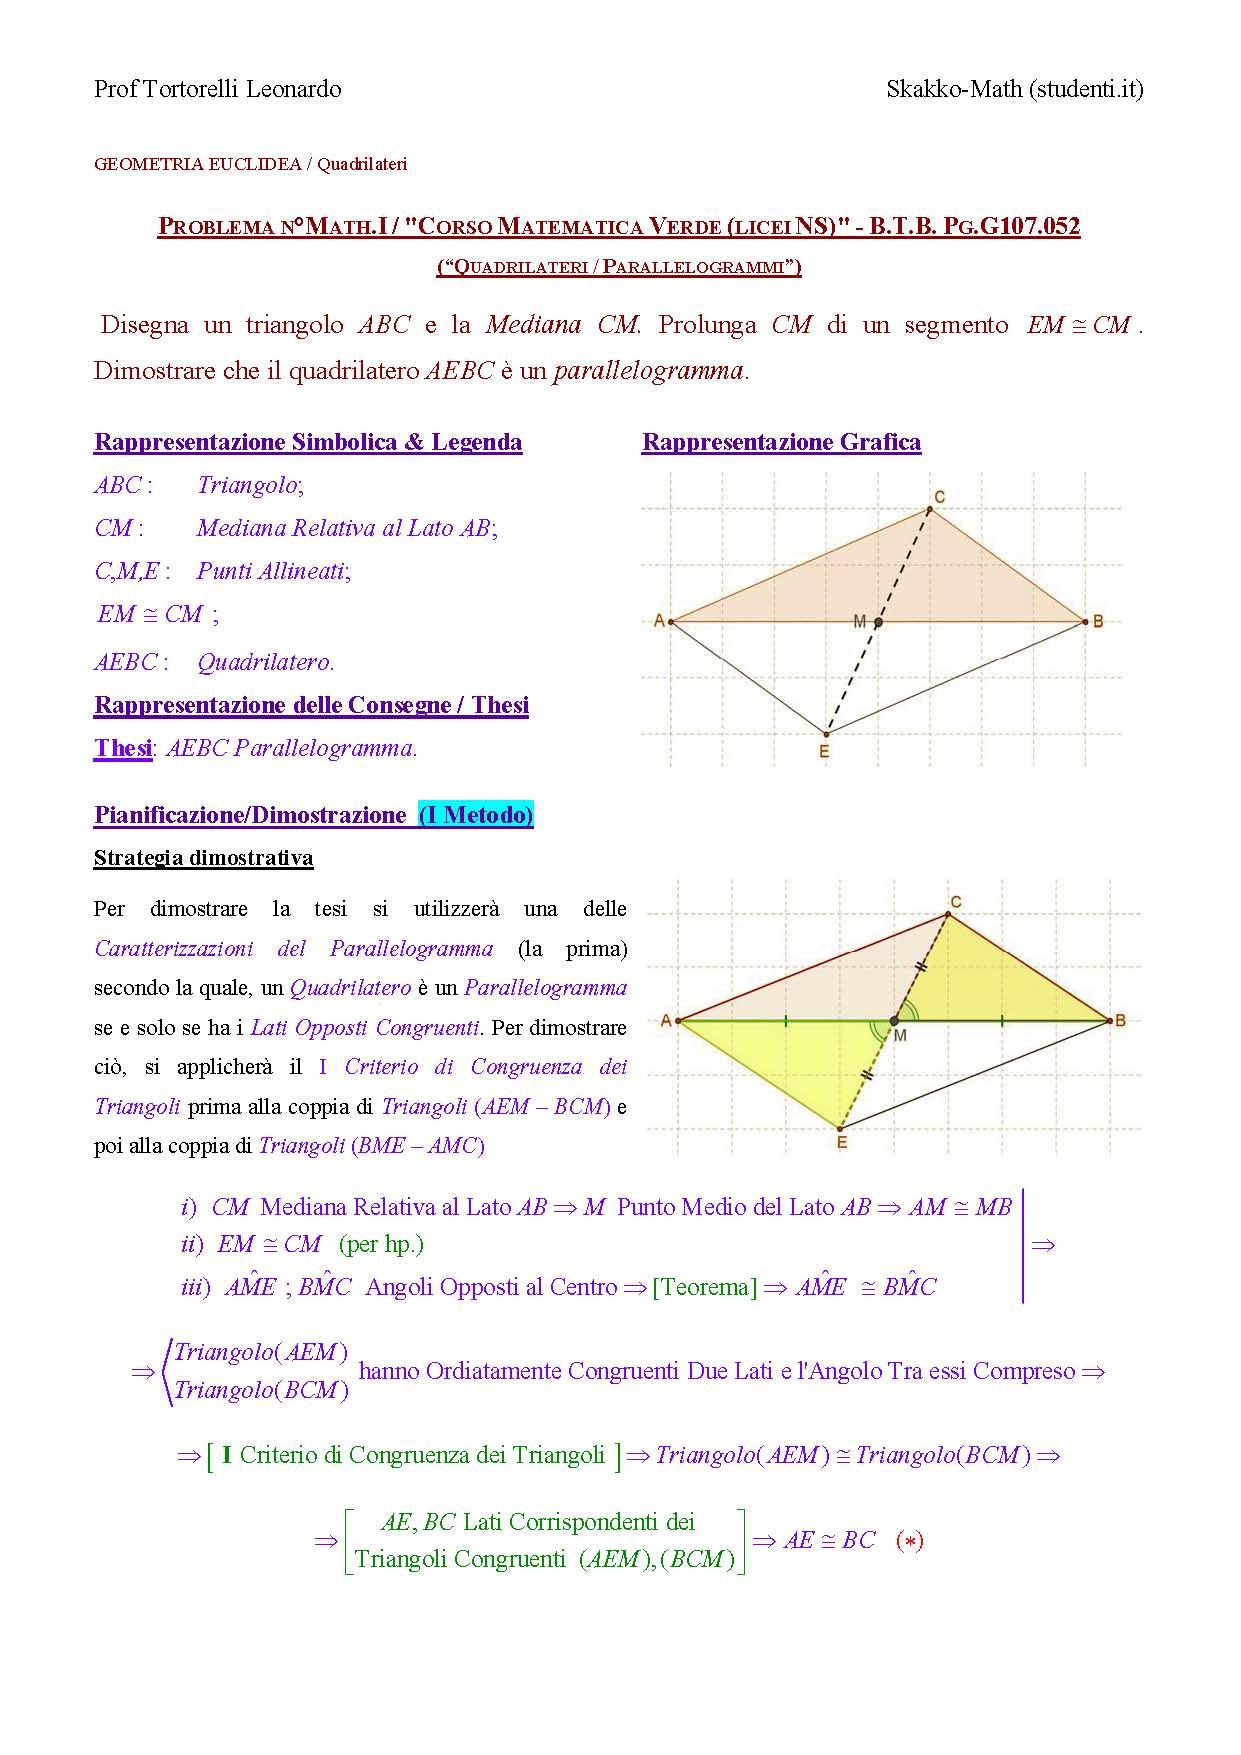 Geometria Problemi Sui Quadrilateri Parallelogrammi G107052